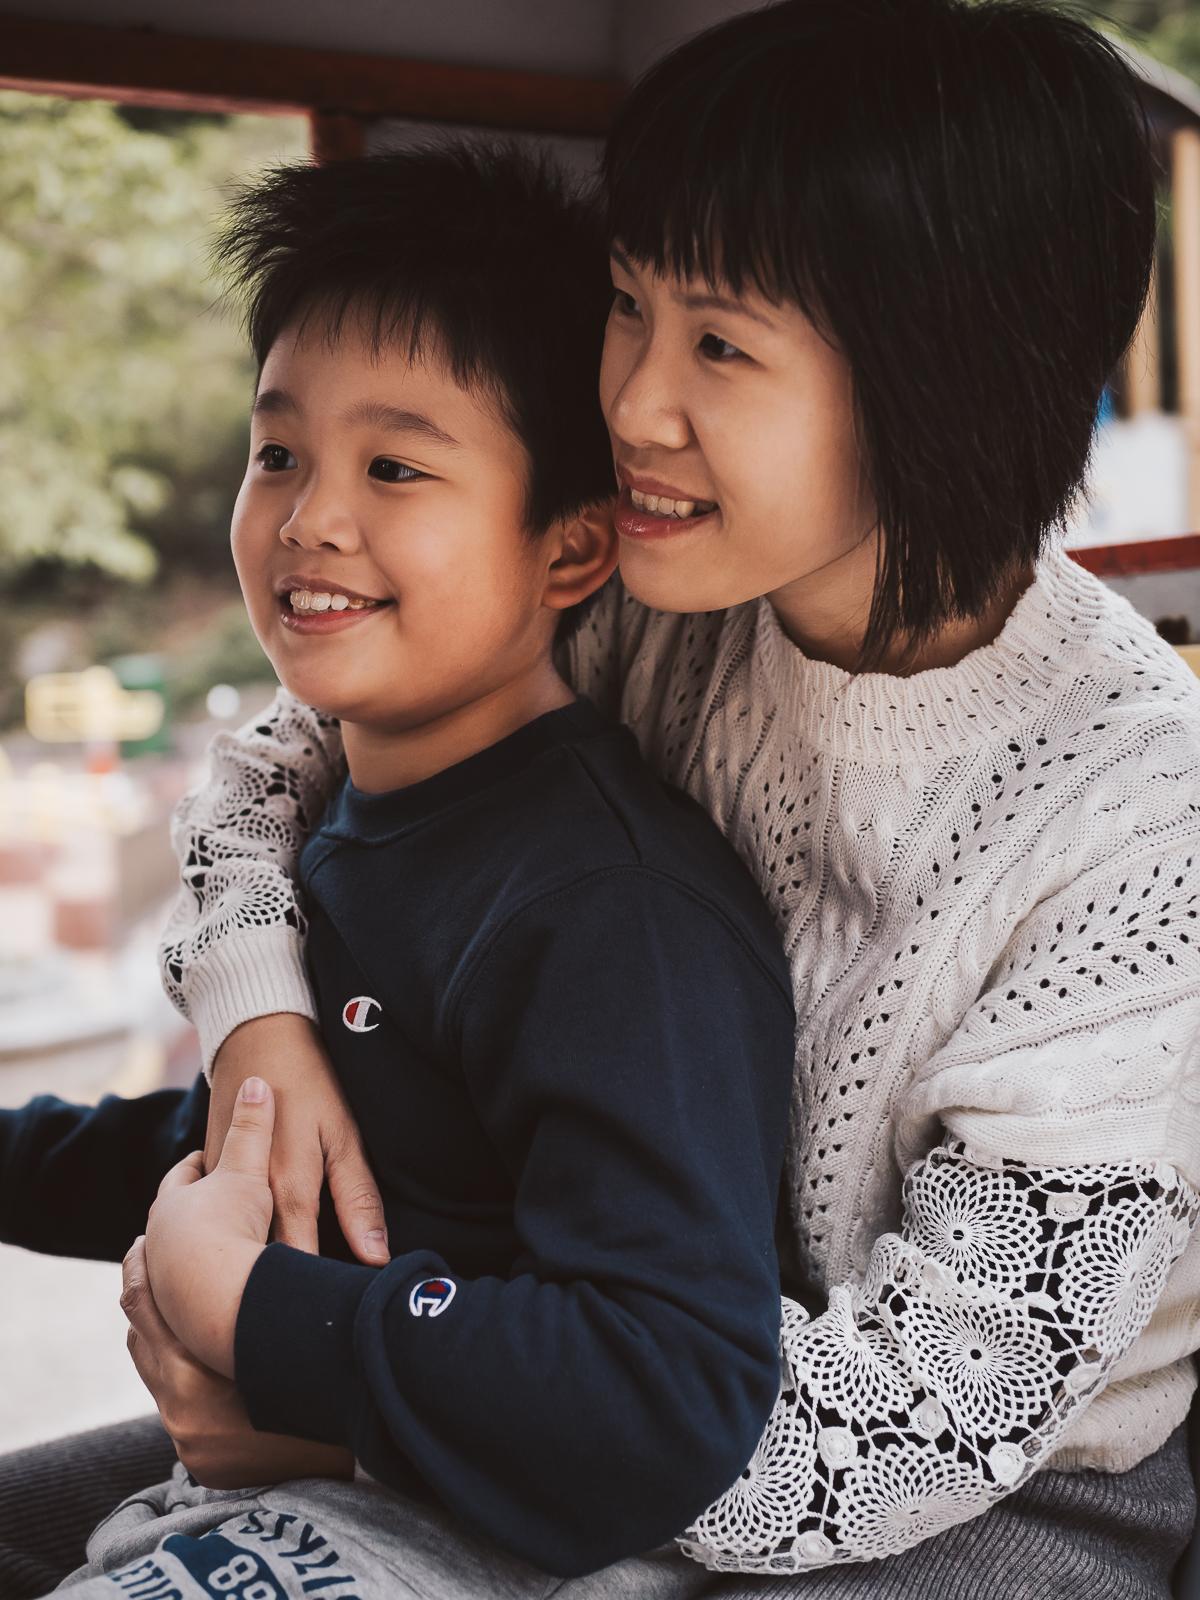 Vince Lai Macau Family Portrait - OlympusEM1MArkii2512 - Yes! Please Enjoy by Fanning Tseng-4.jpg